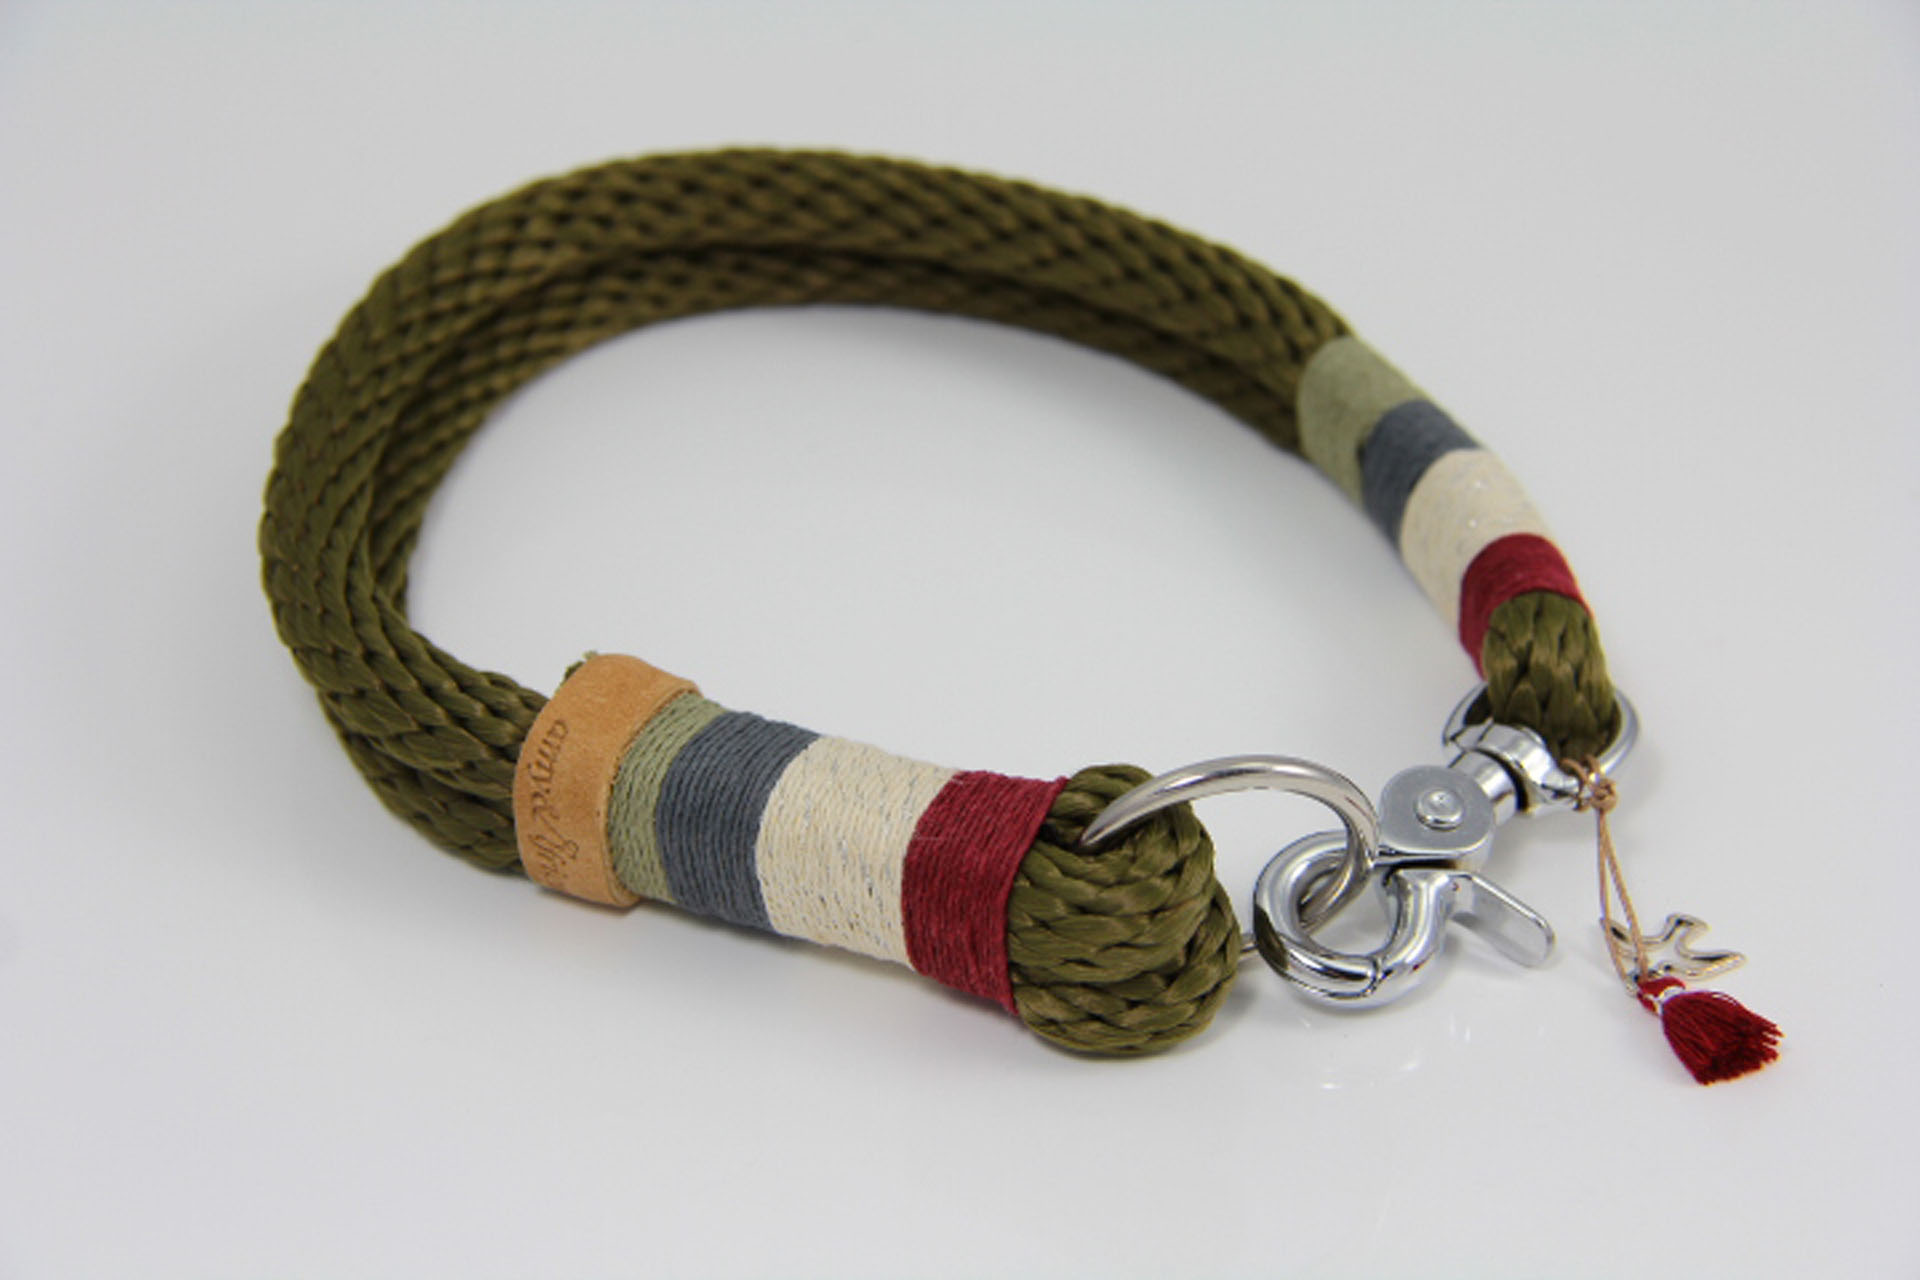 Tauhalsband-amy-and-friends-oliv-burgunder-silber-metallic-dunkelgrau-oliv